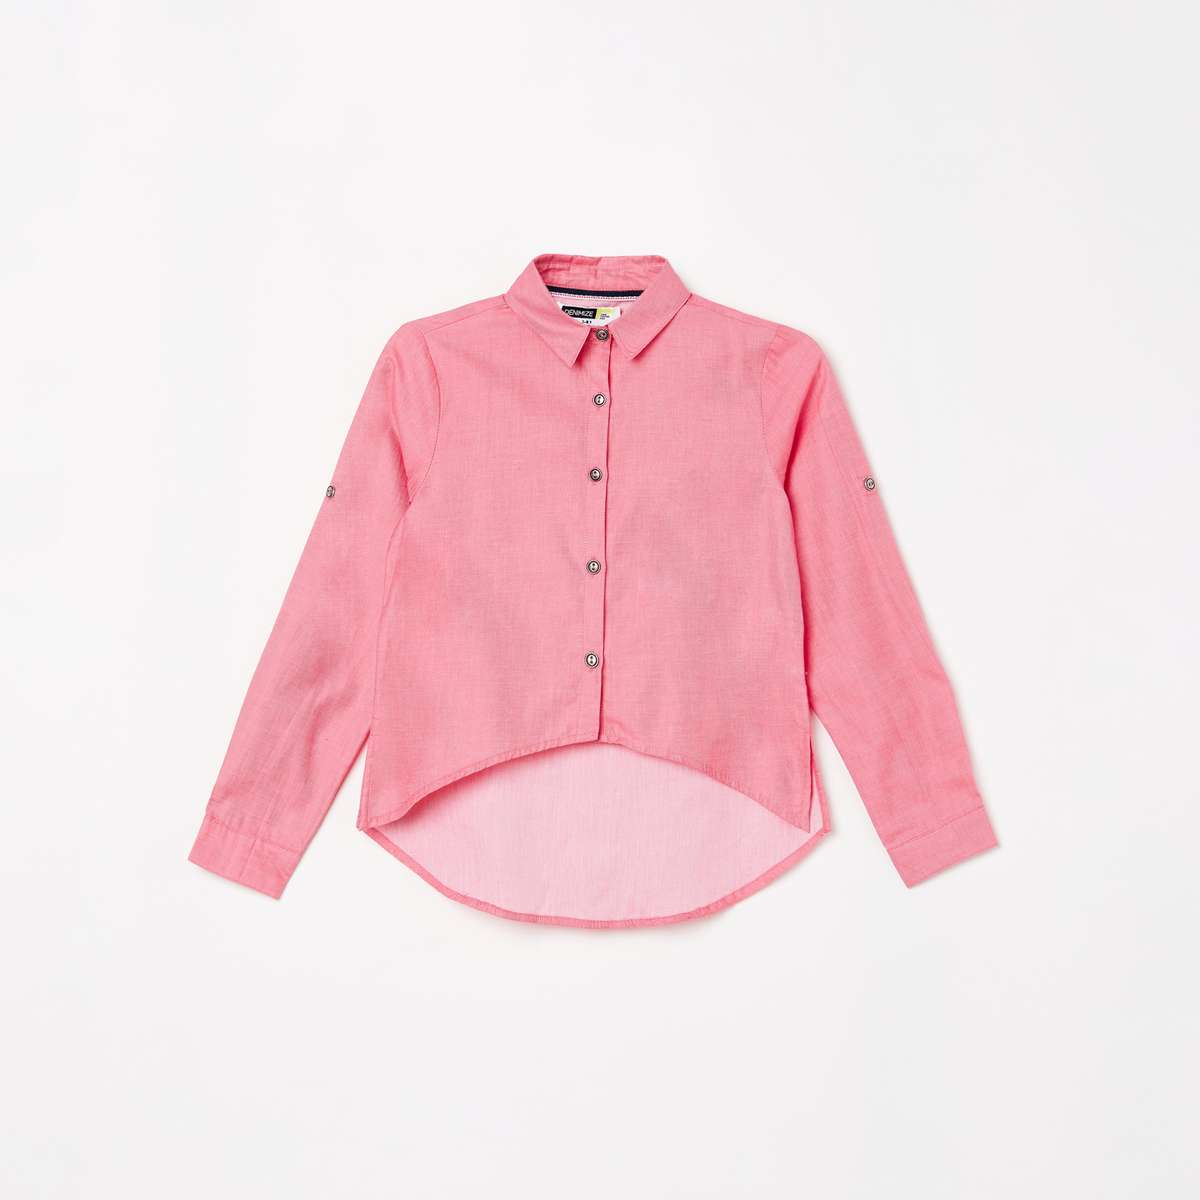 5.DENIMIZE Girls Solid High-Low Hem Shirt